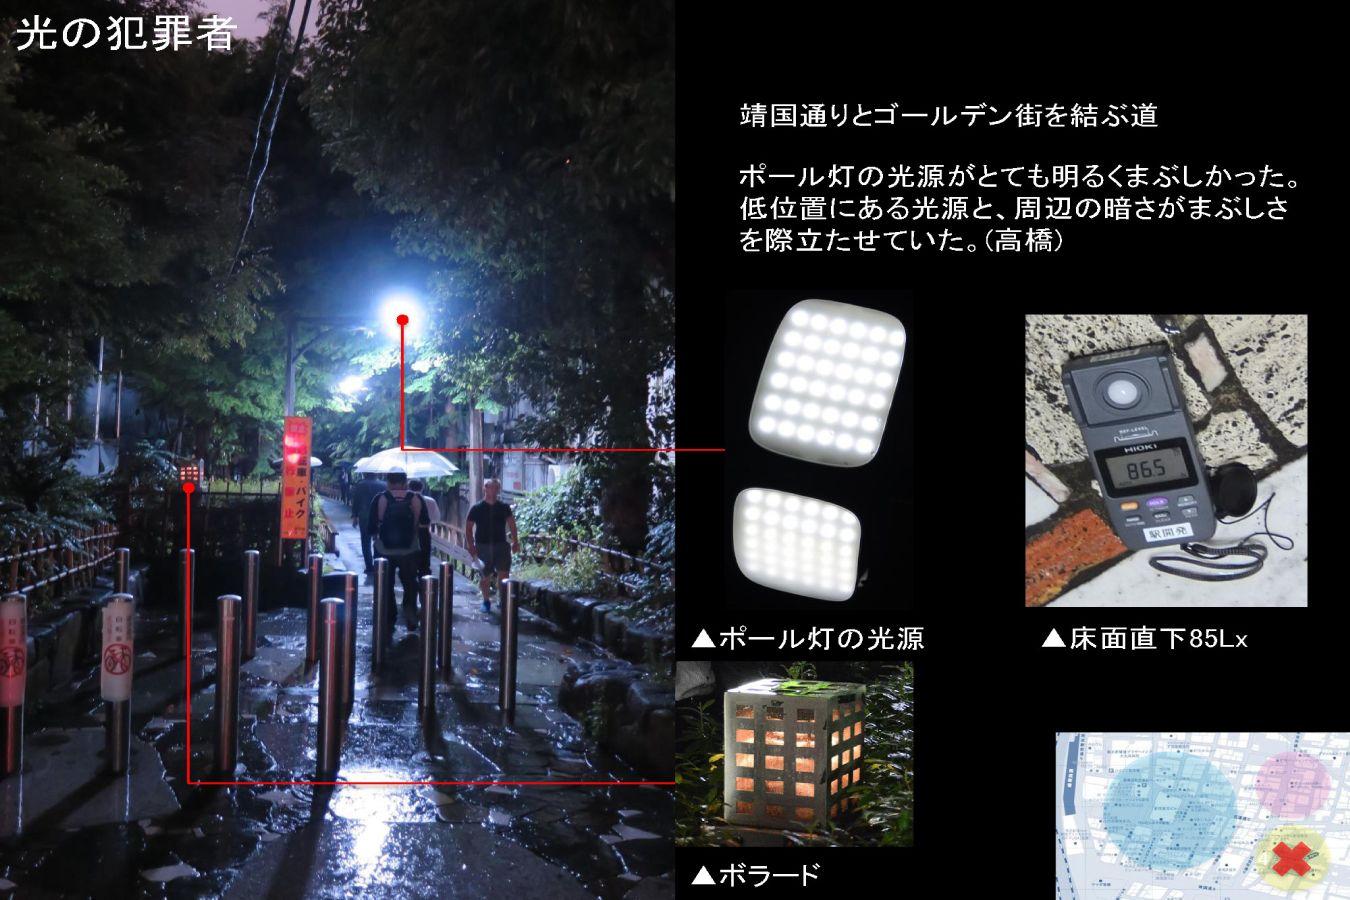 150623_4班_歌舞伎町街歩き 4